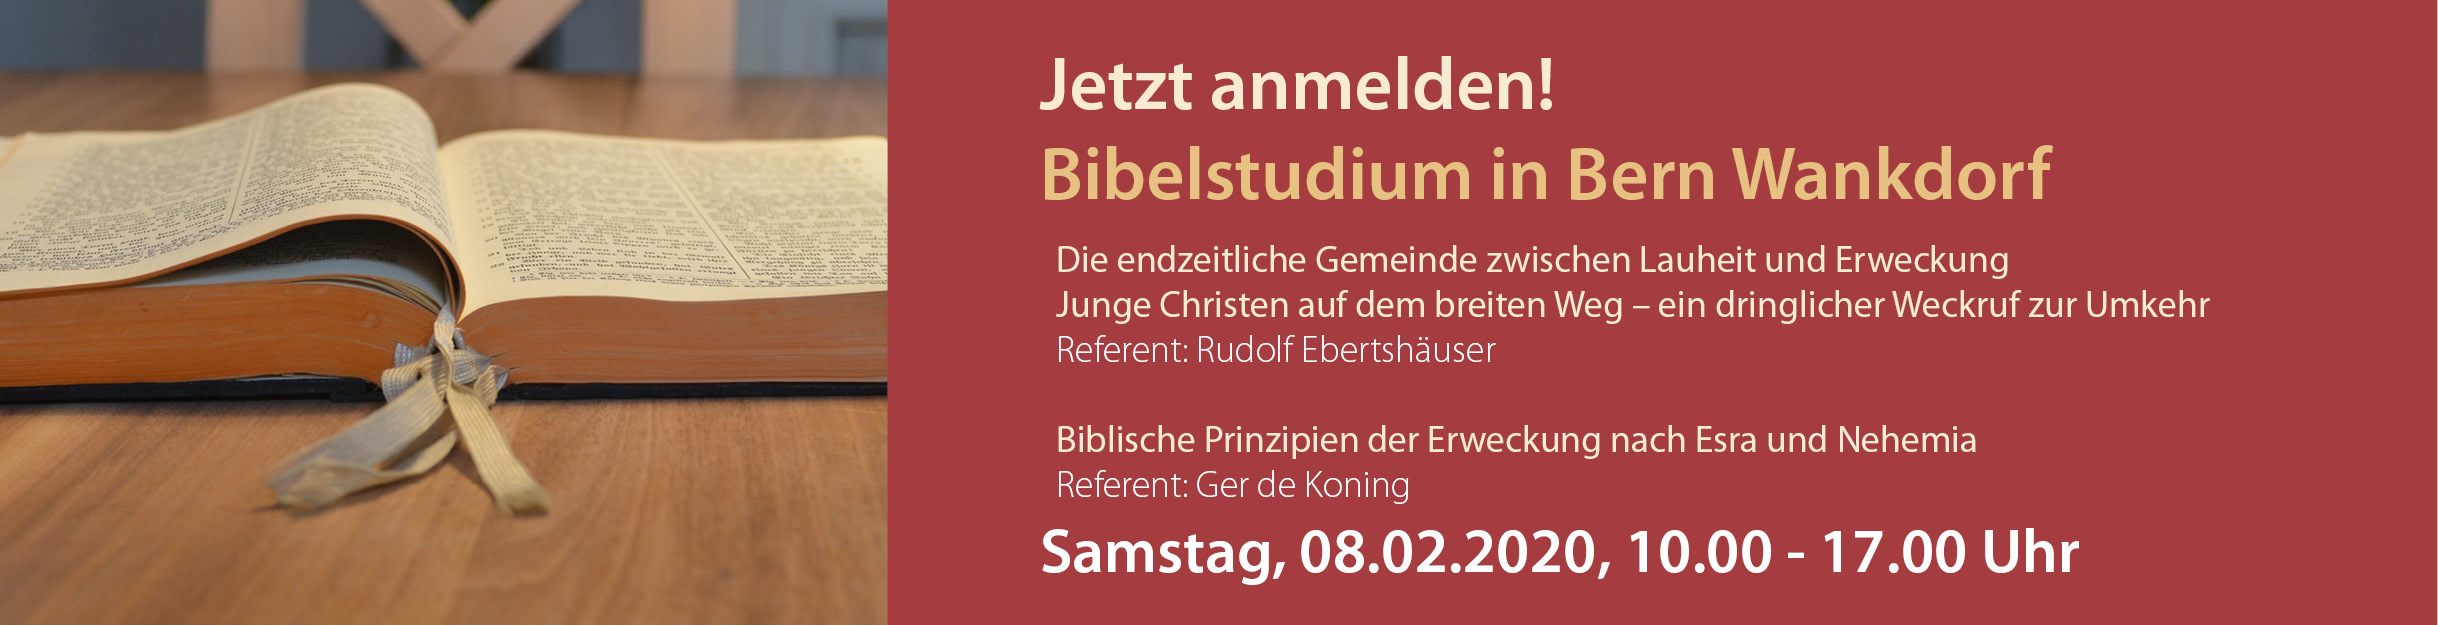 Bibeltag Bern